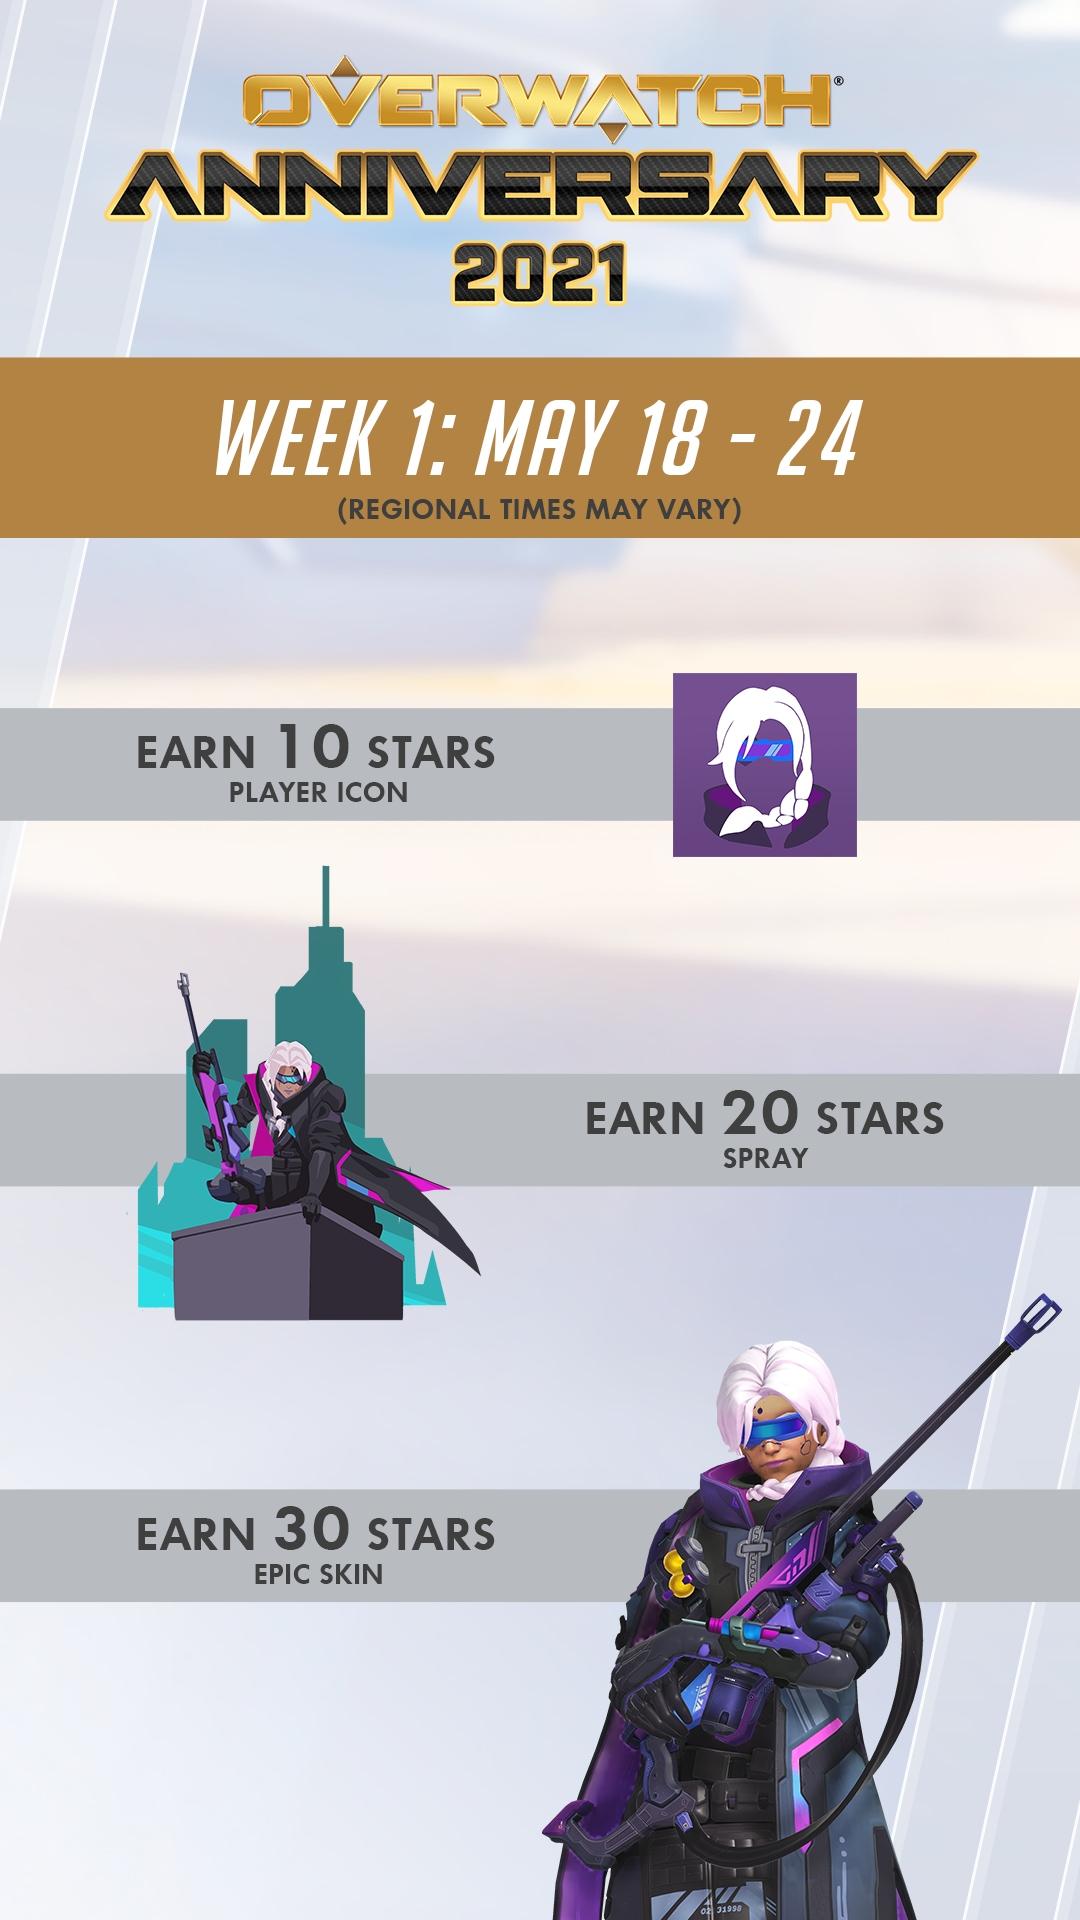 Week 1 Rewards